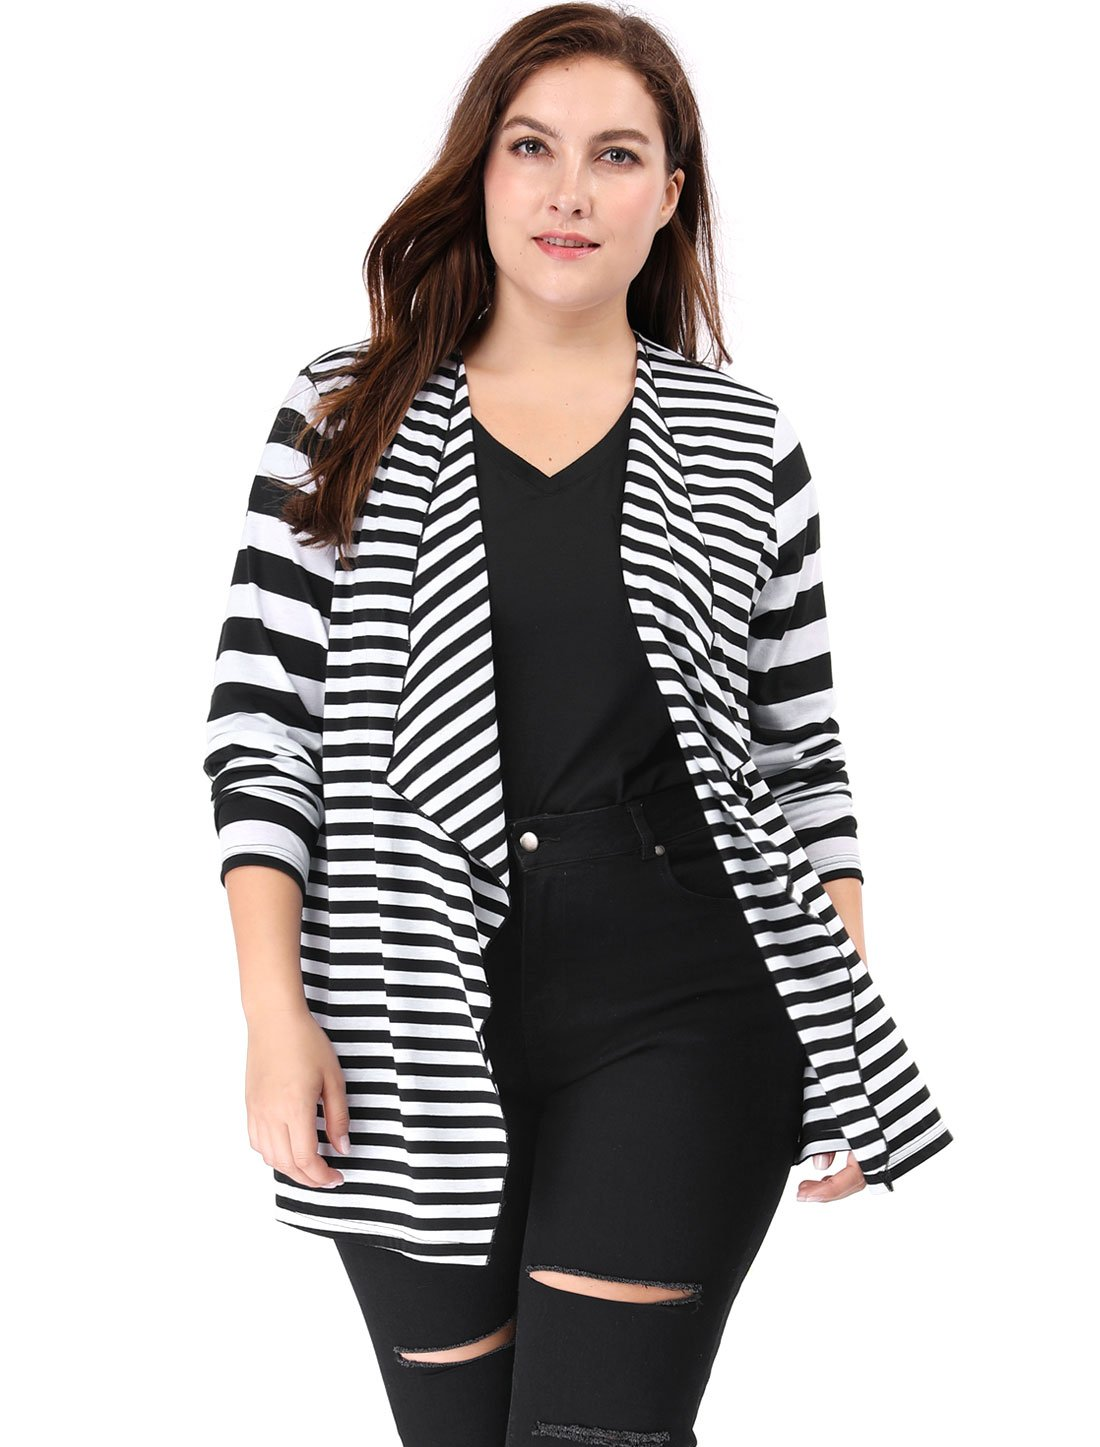 Agnes Orinda Women's Plus Size Open Front Mixed Striped Cardigan 2X Black